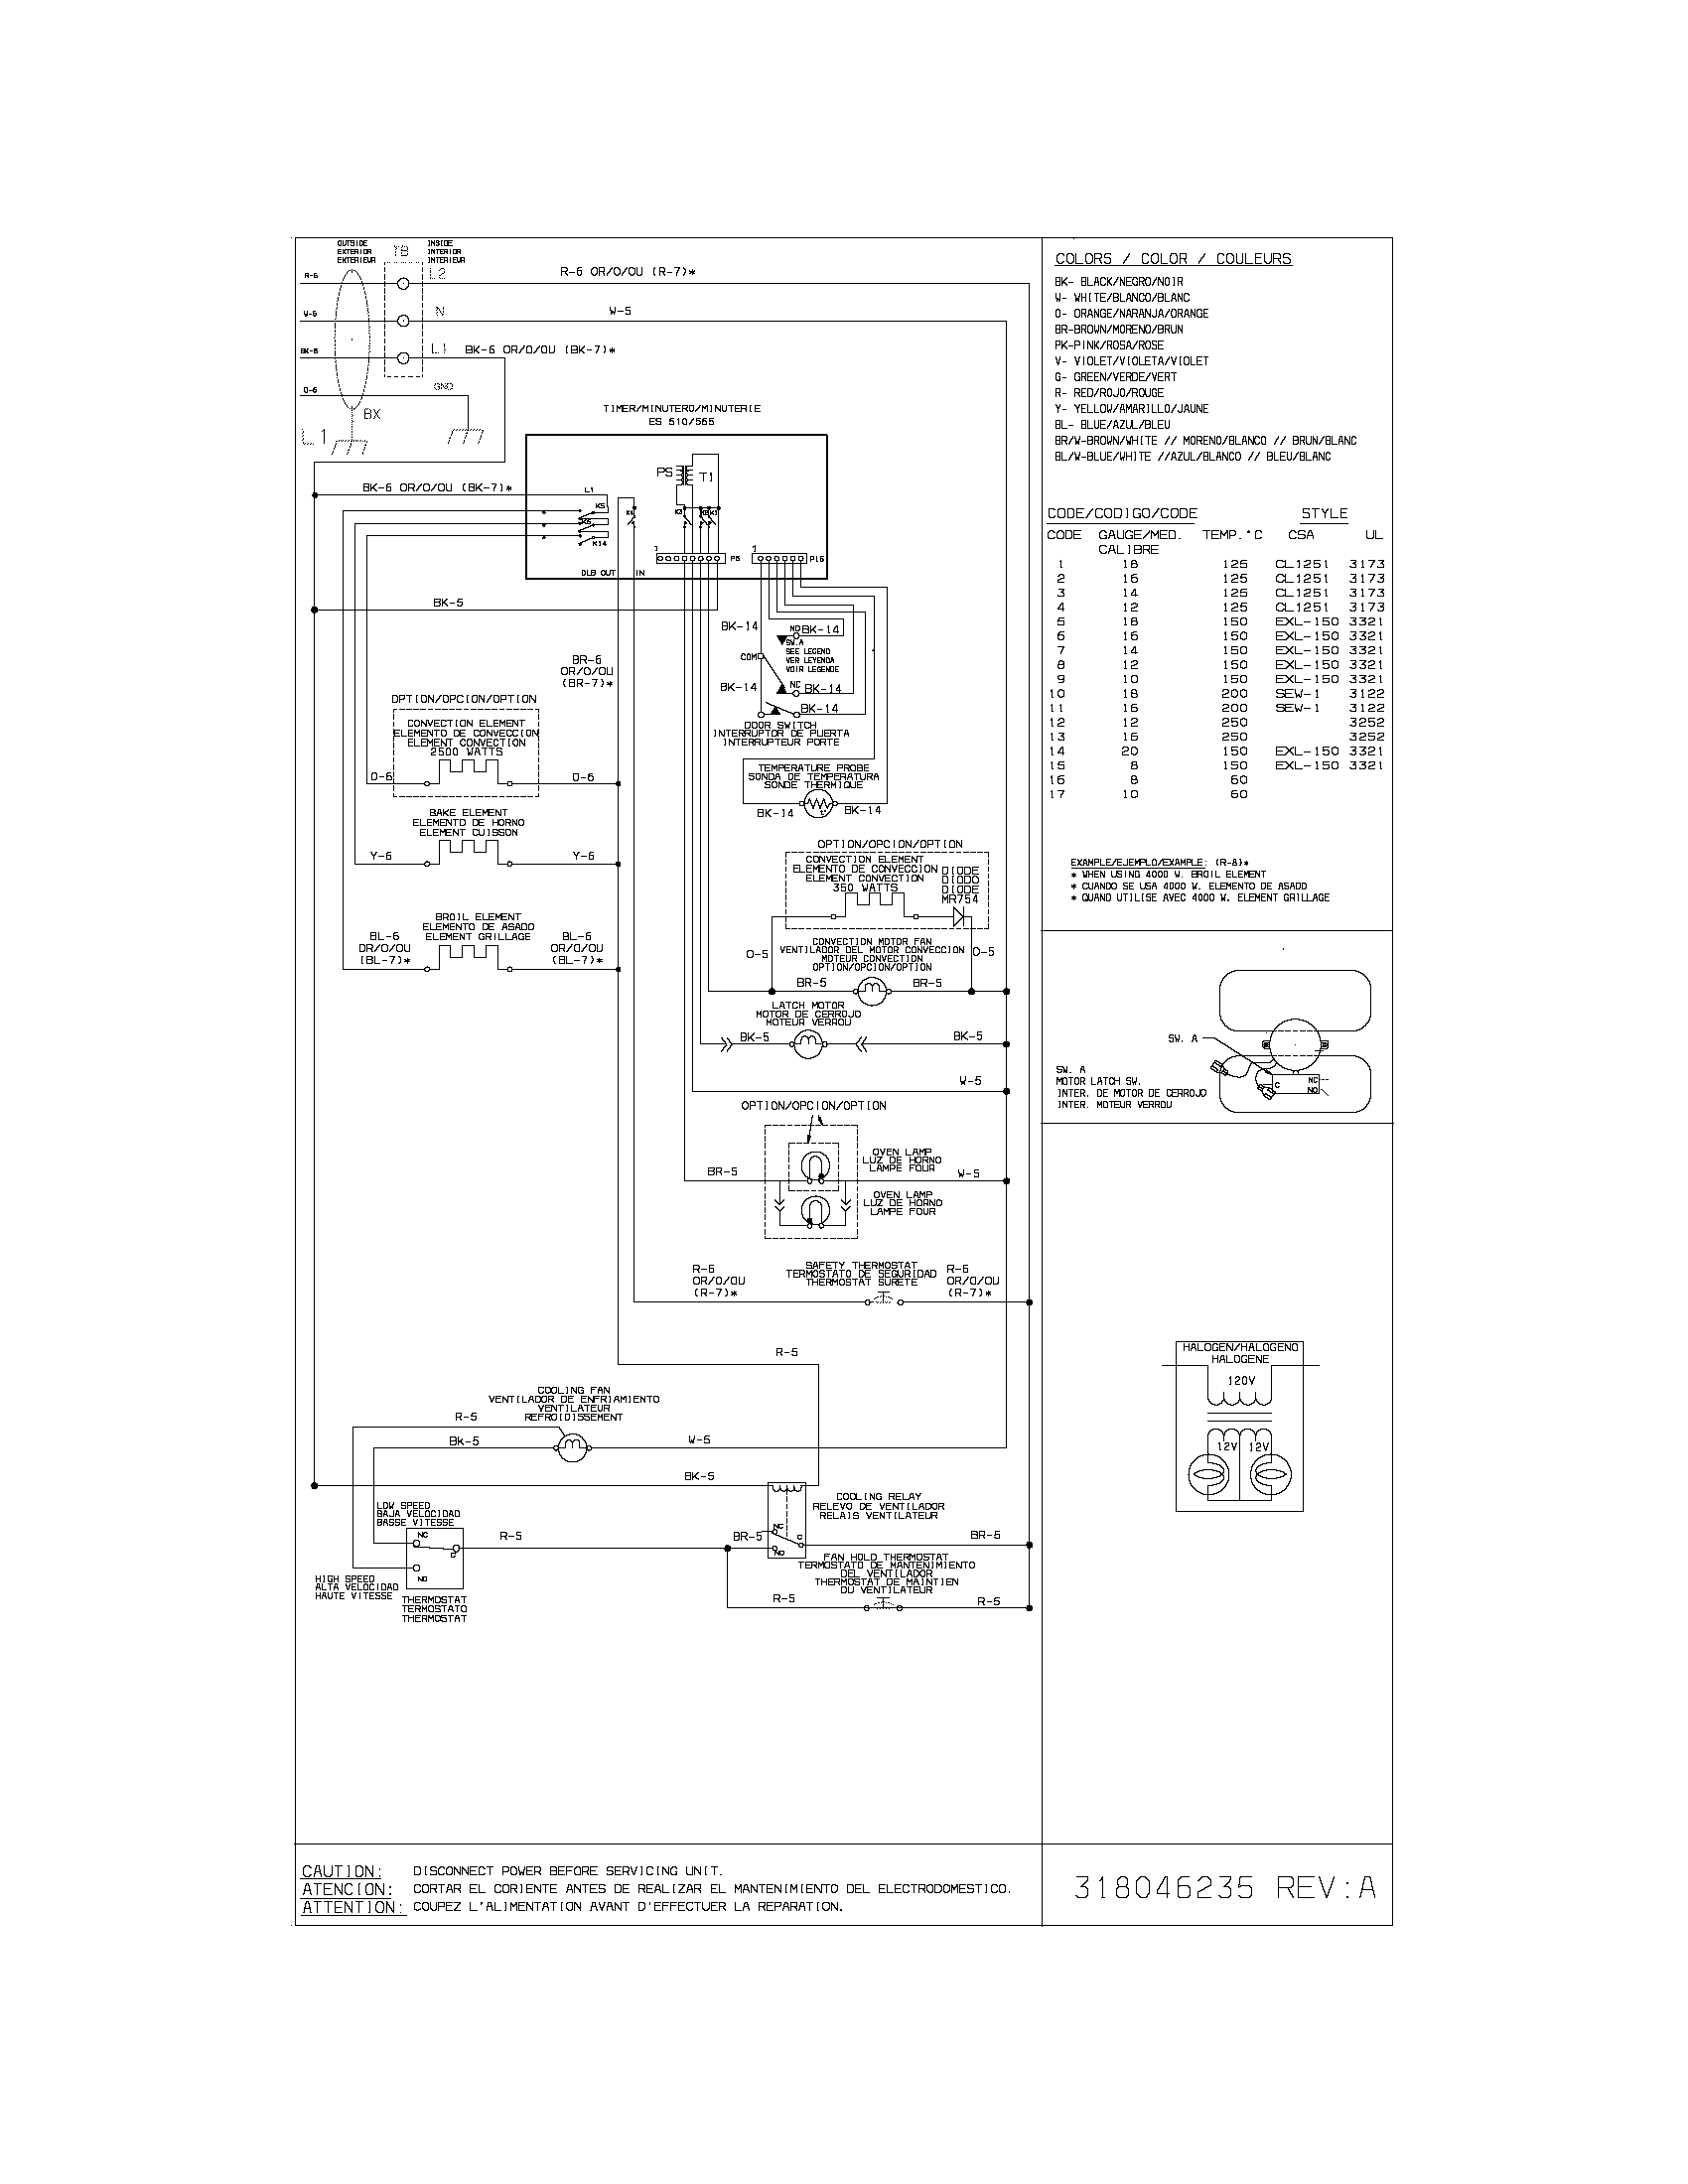 wiring diagram parts?resize=665%2C861&ssl=1 ge monitor top wiring diagram ge dishwasher diagram, ge repair ge stove wiring diagram at reclaimingppi.co